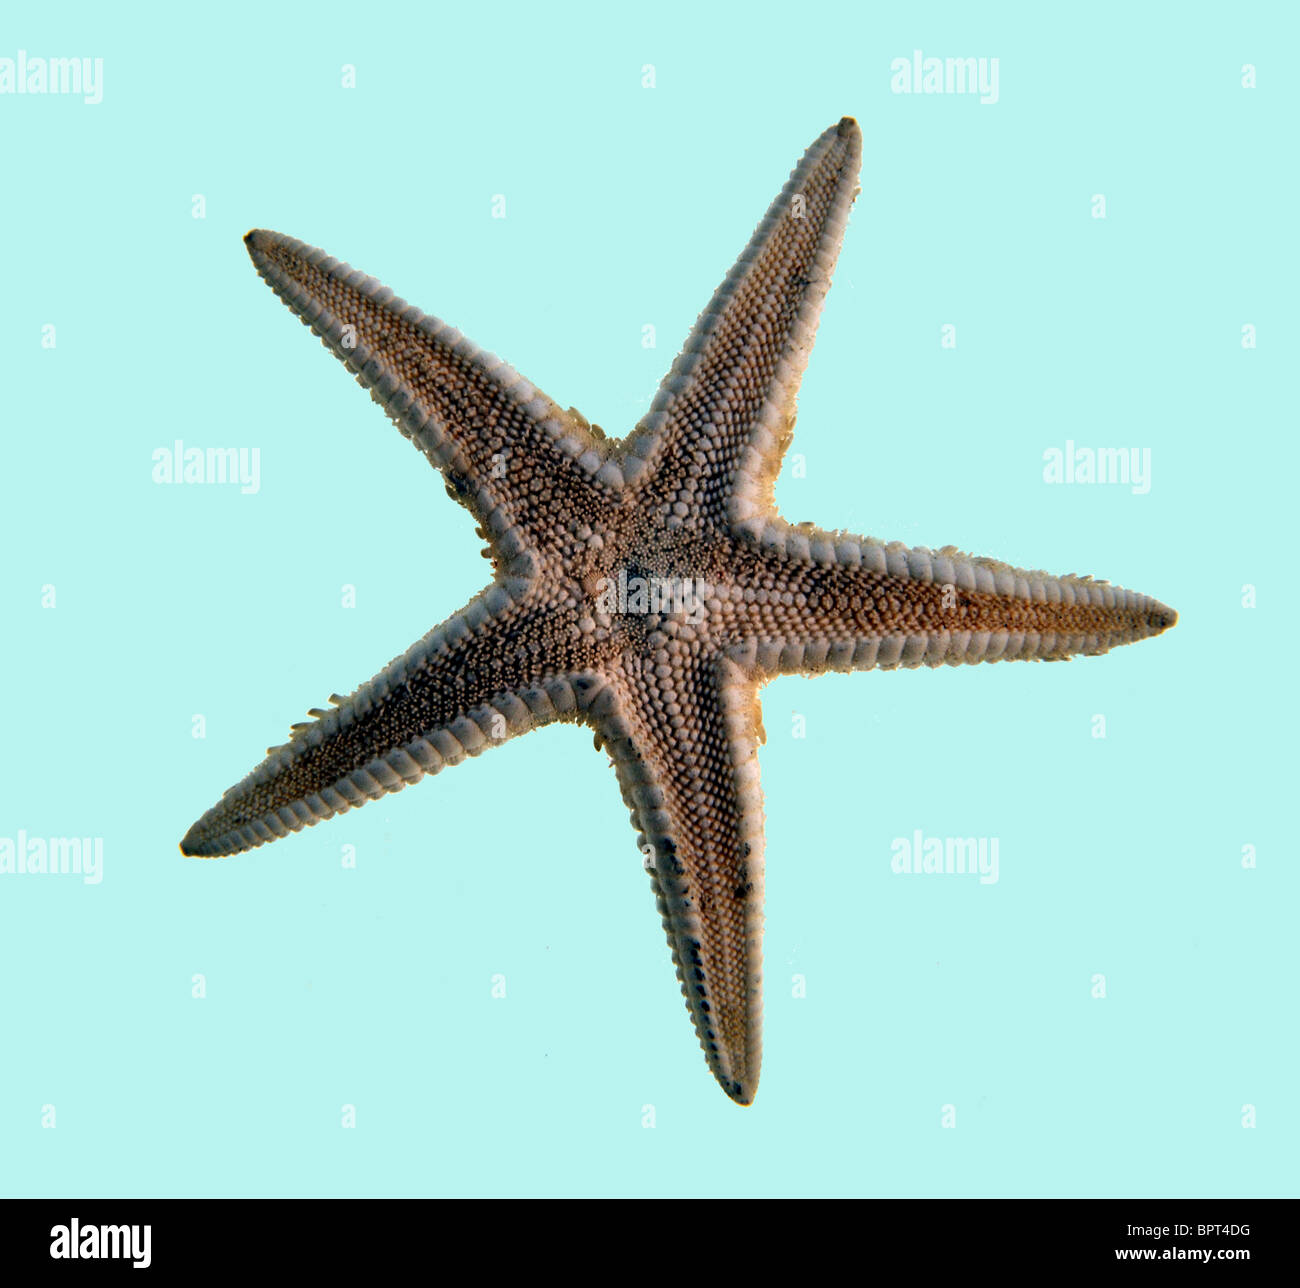 Starfish on a plain light blue background - Stock Image